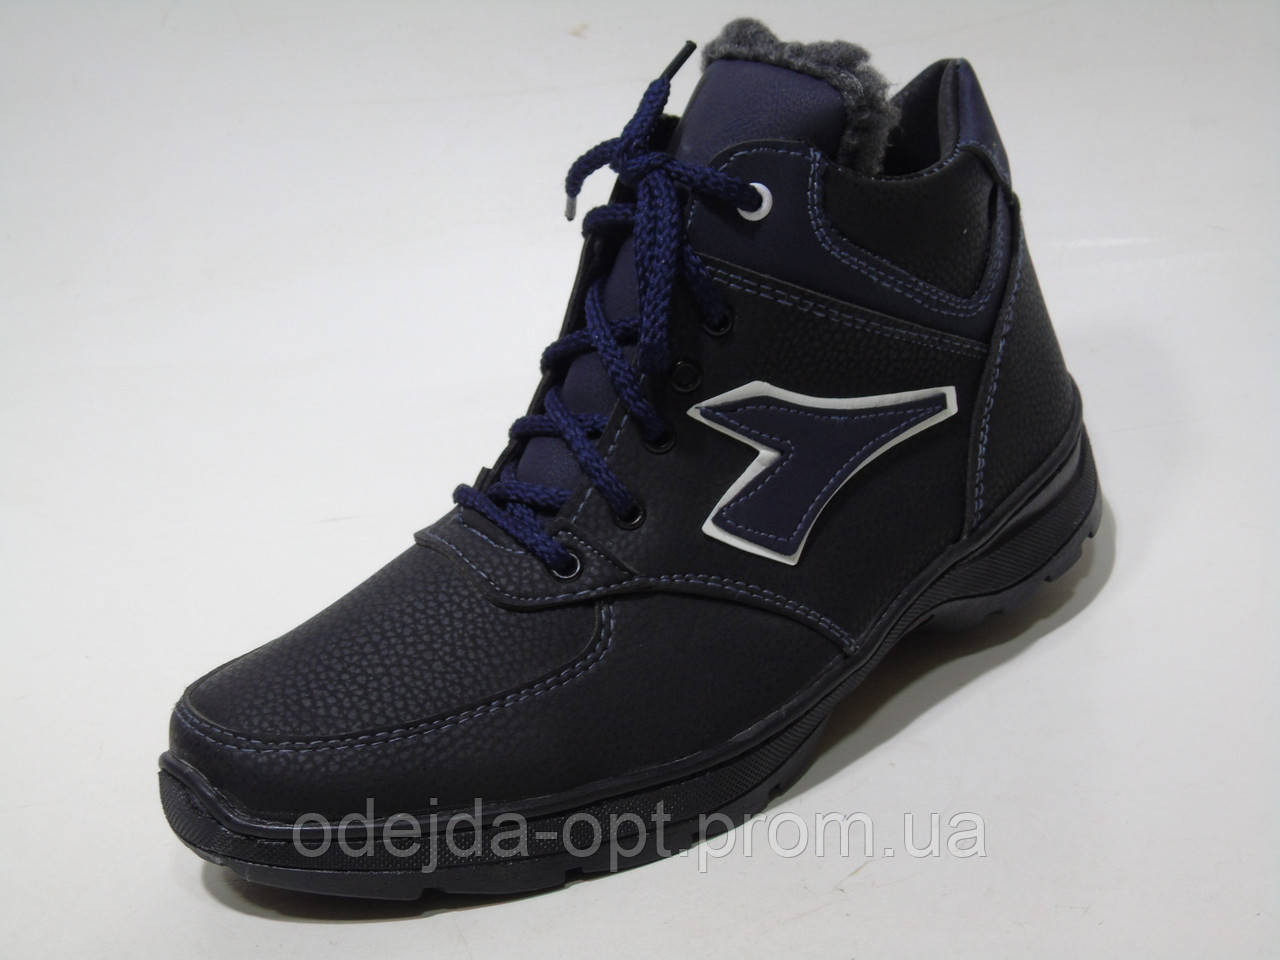 Ботинки мужские зима Lyoma 40-45